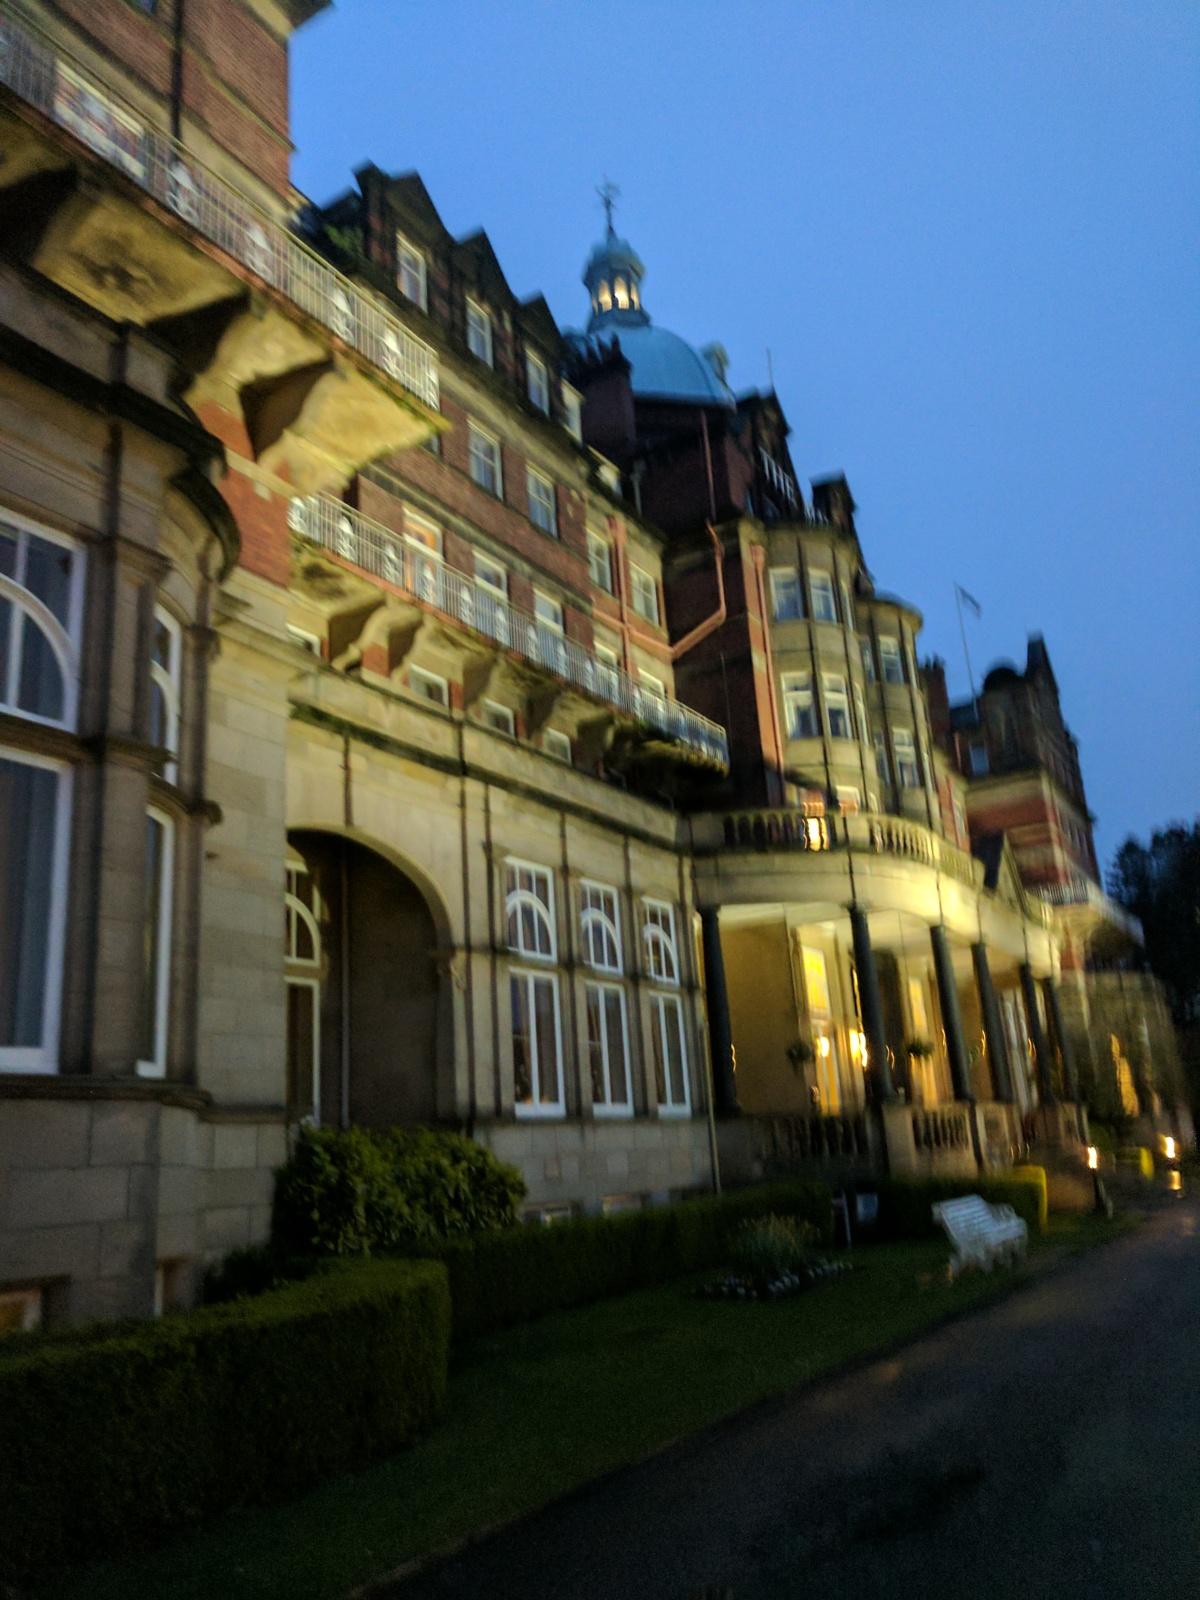 Harrogate and The MajesticHotel